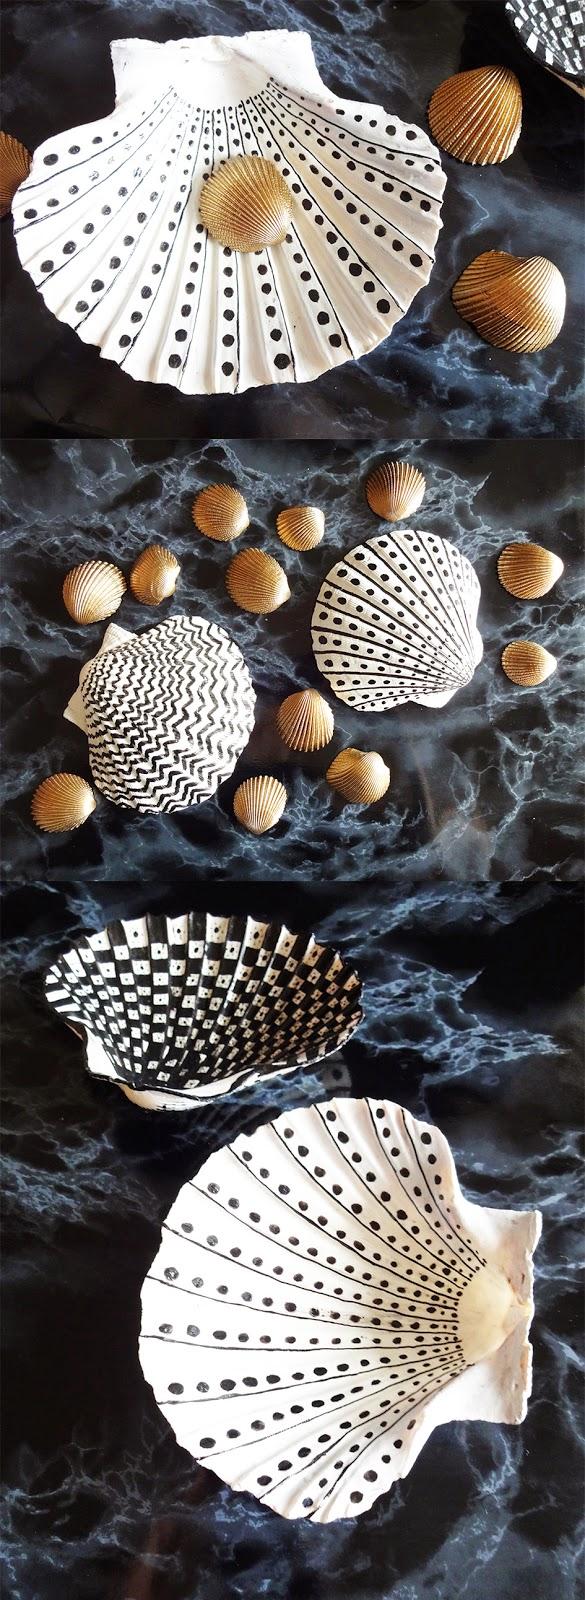 basteln malen kuchen backen seifenschalen aus muscheln. Black Bedroom Furniture Sets. Home Design Ideas